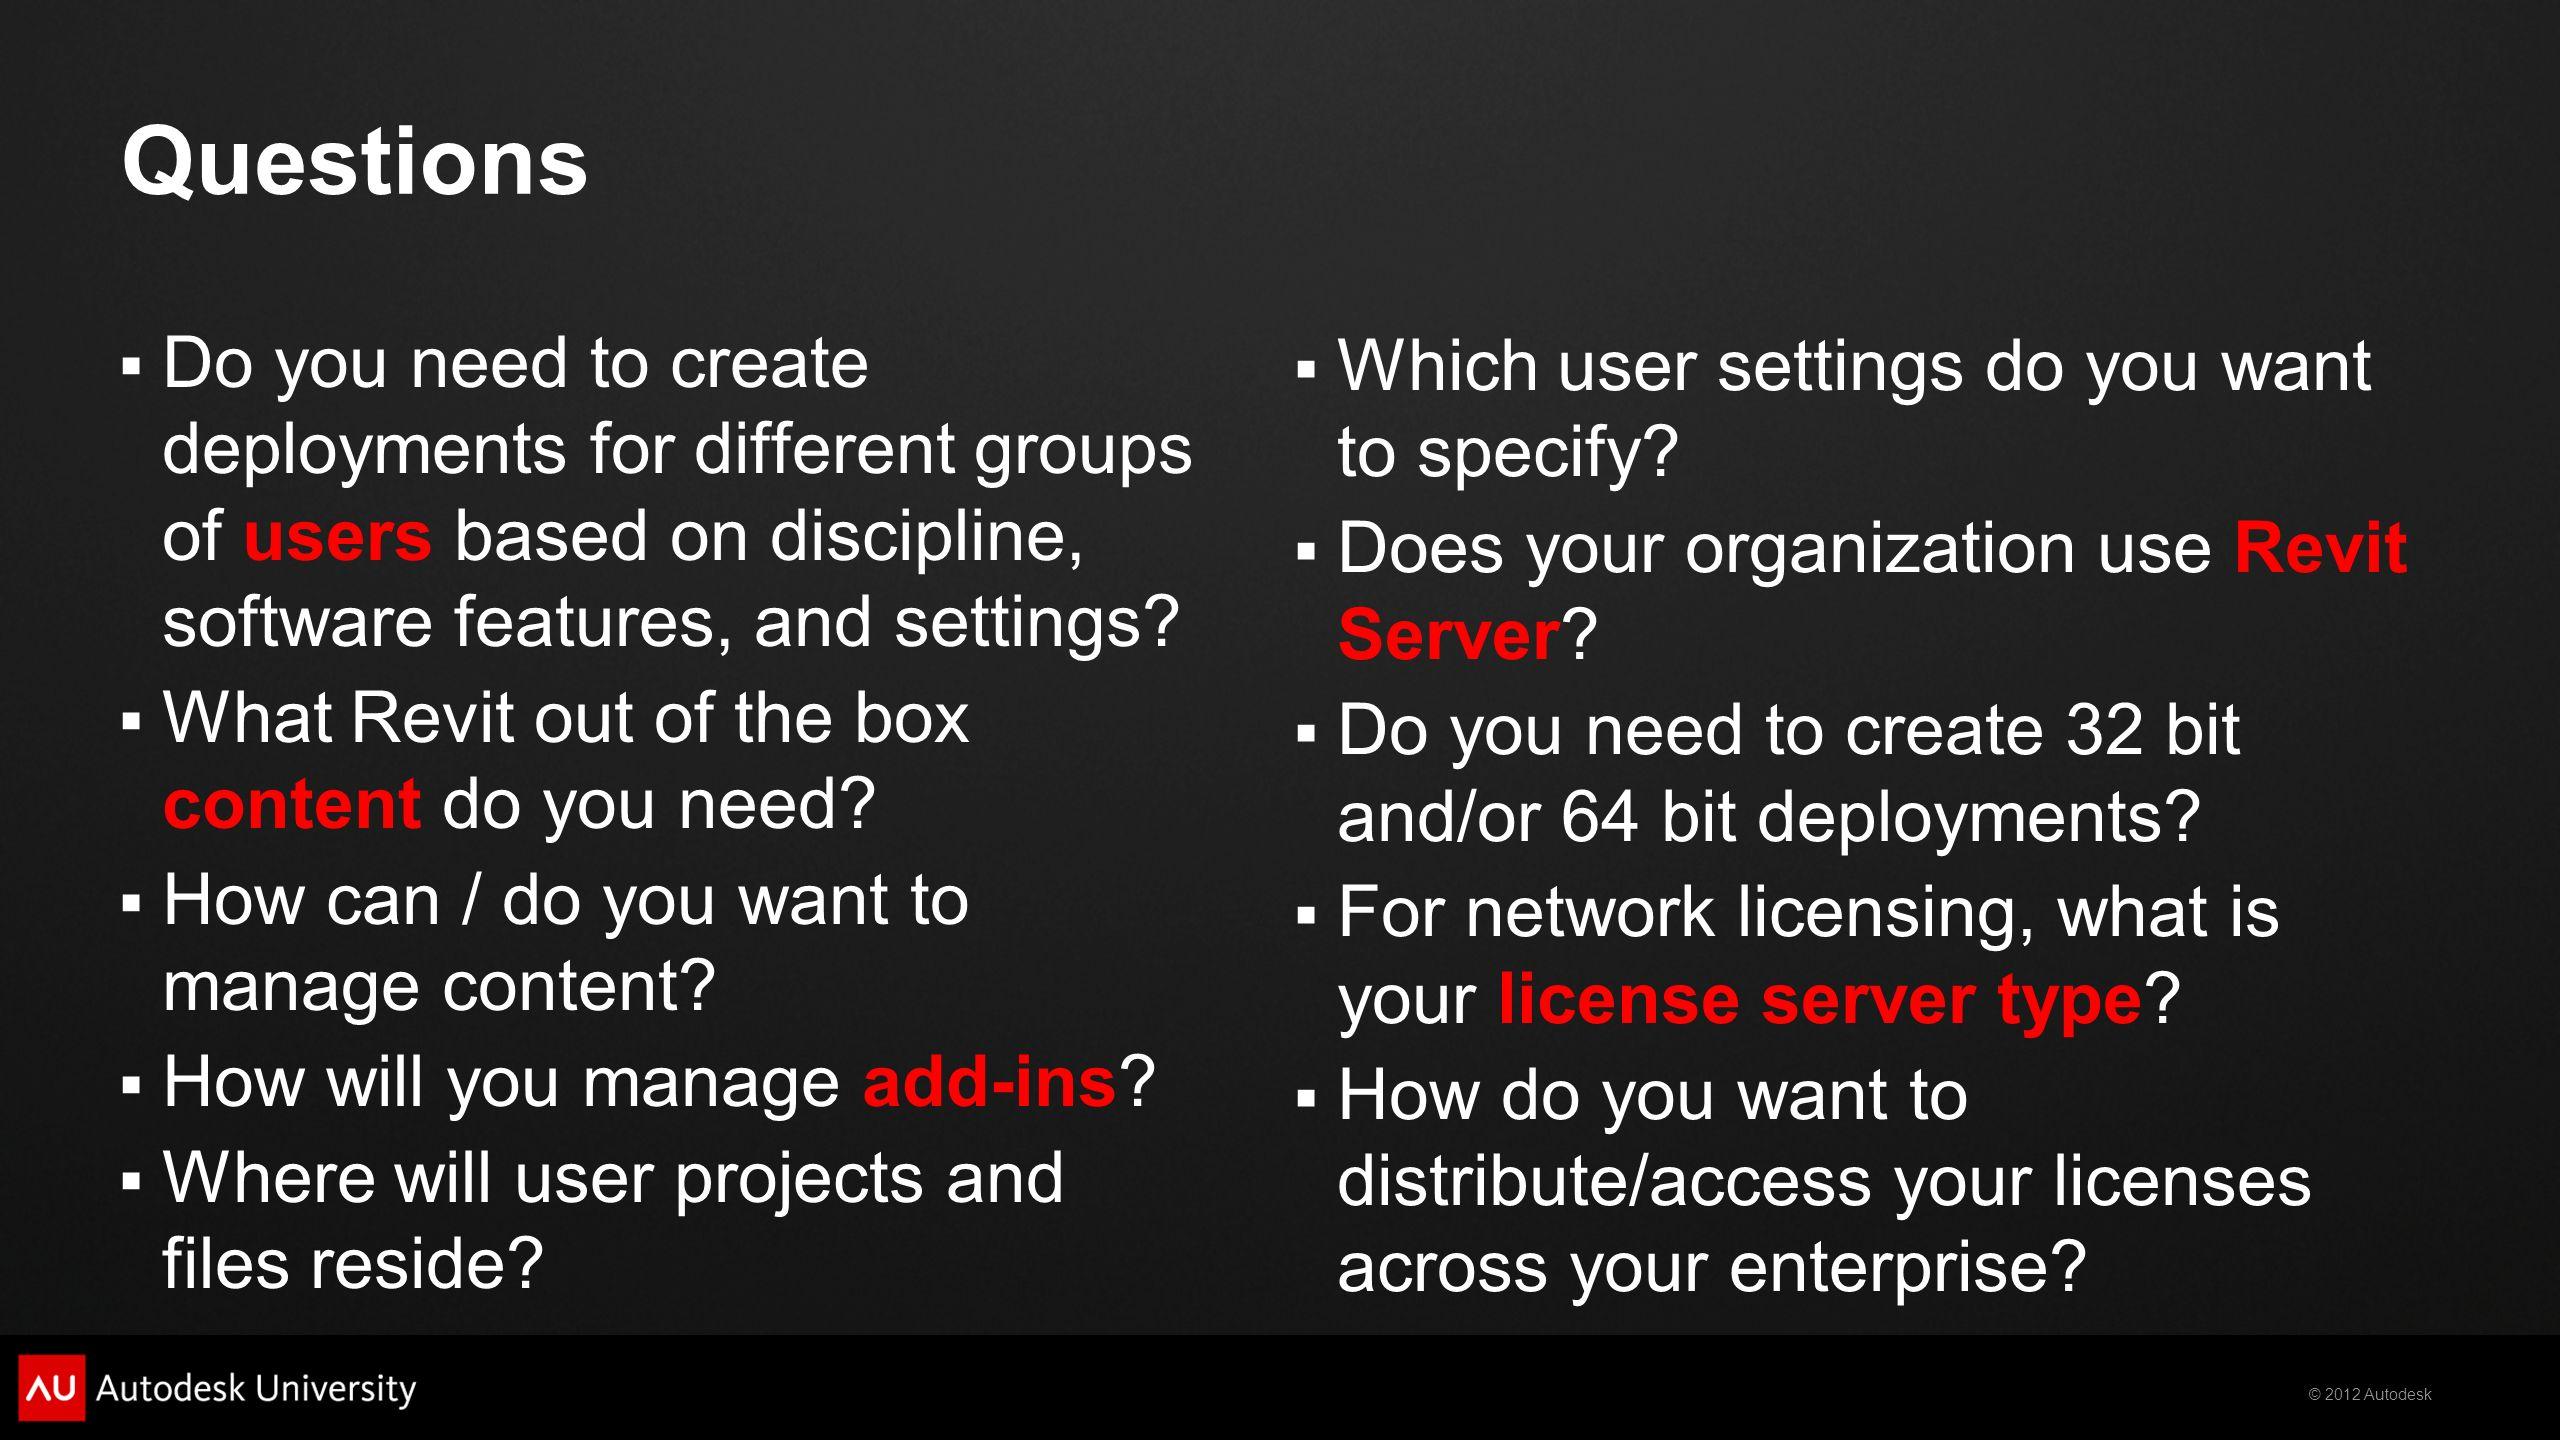 2012 Autodesk The Enterprise Guide to Autodesk Revit Harlan